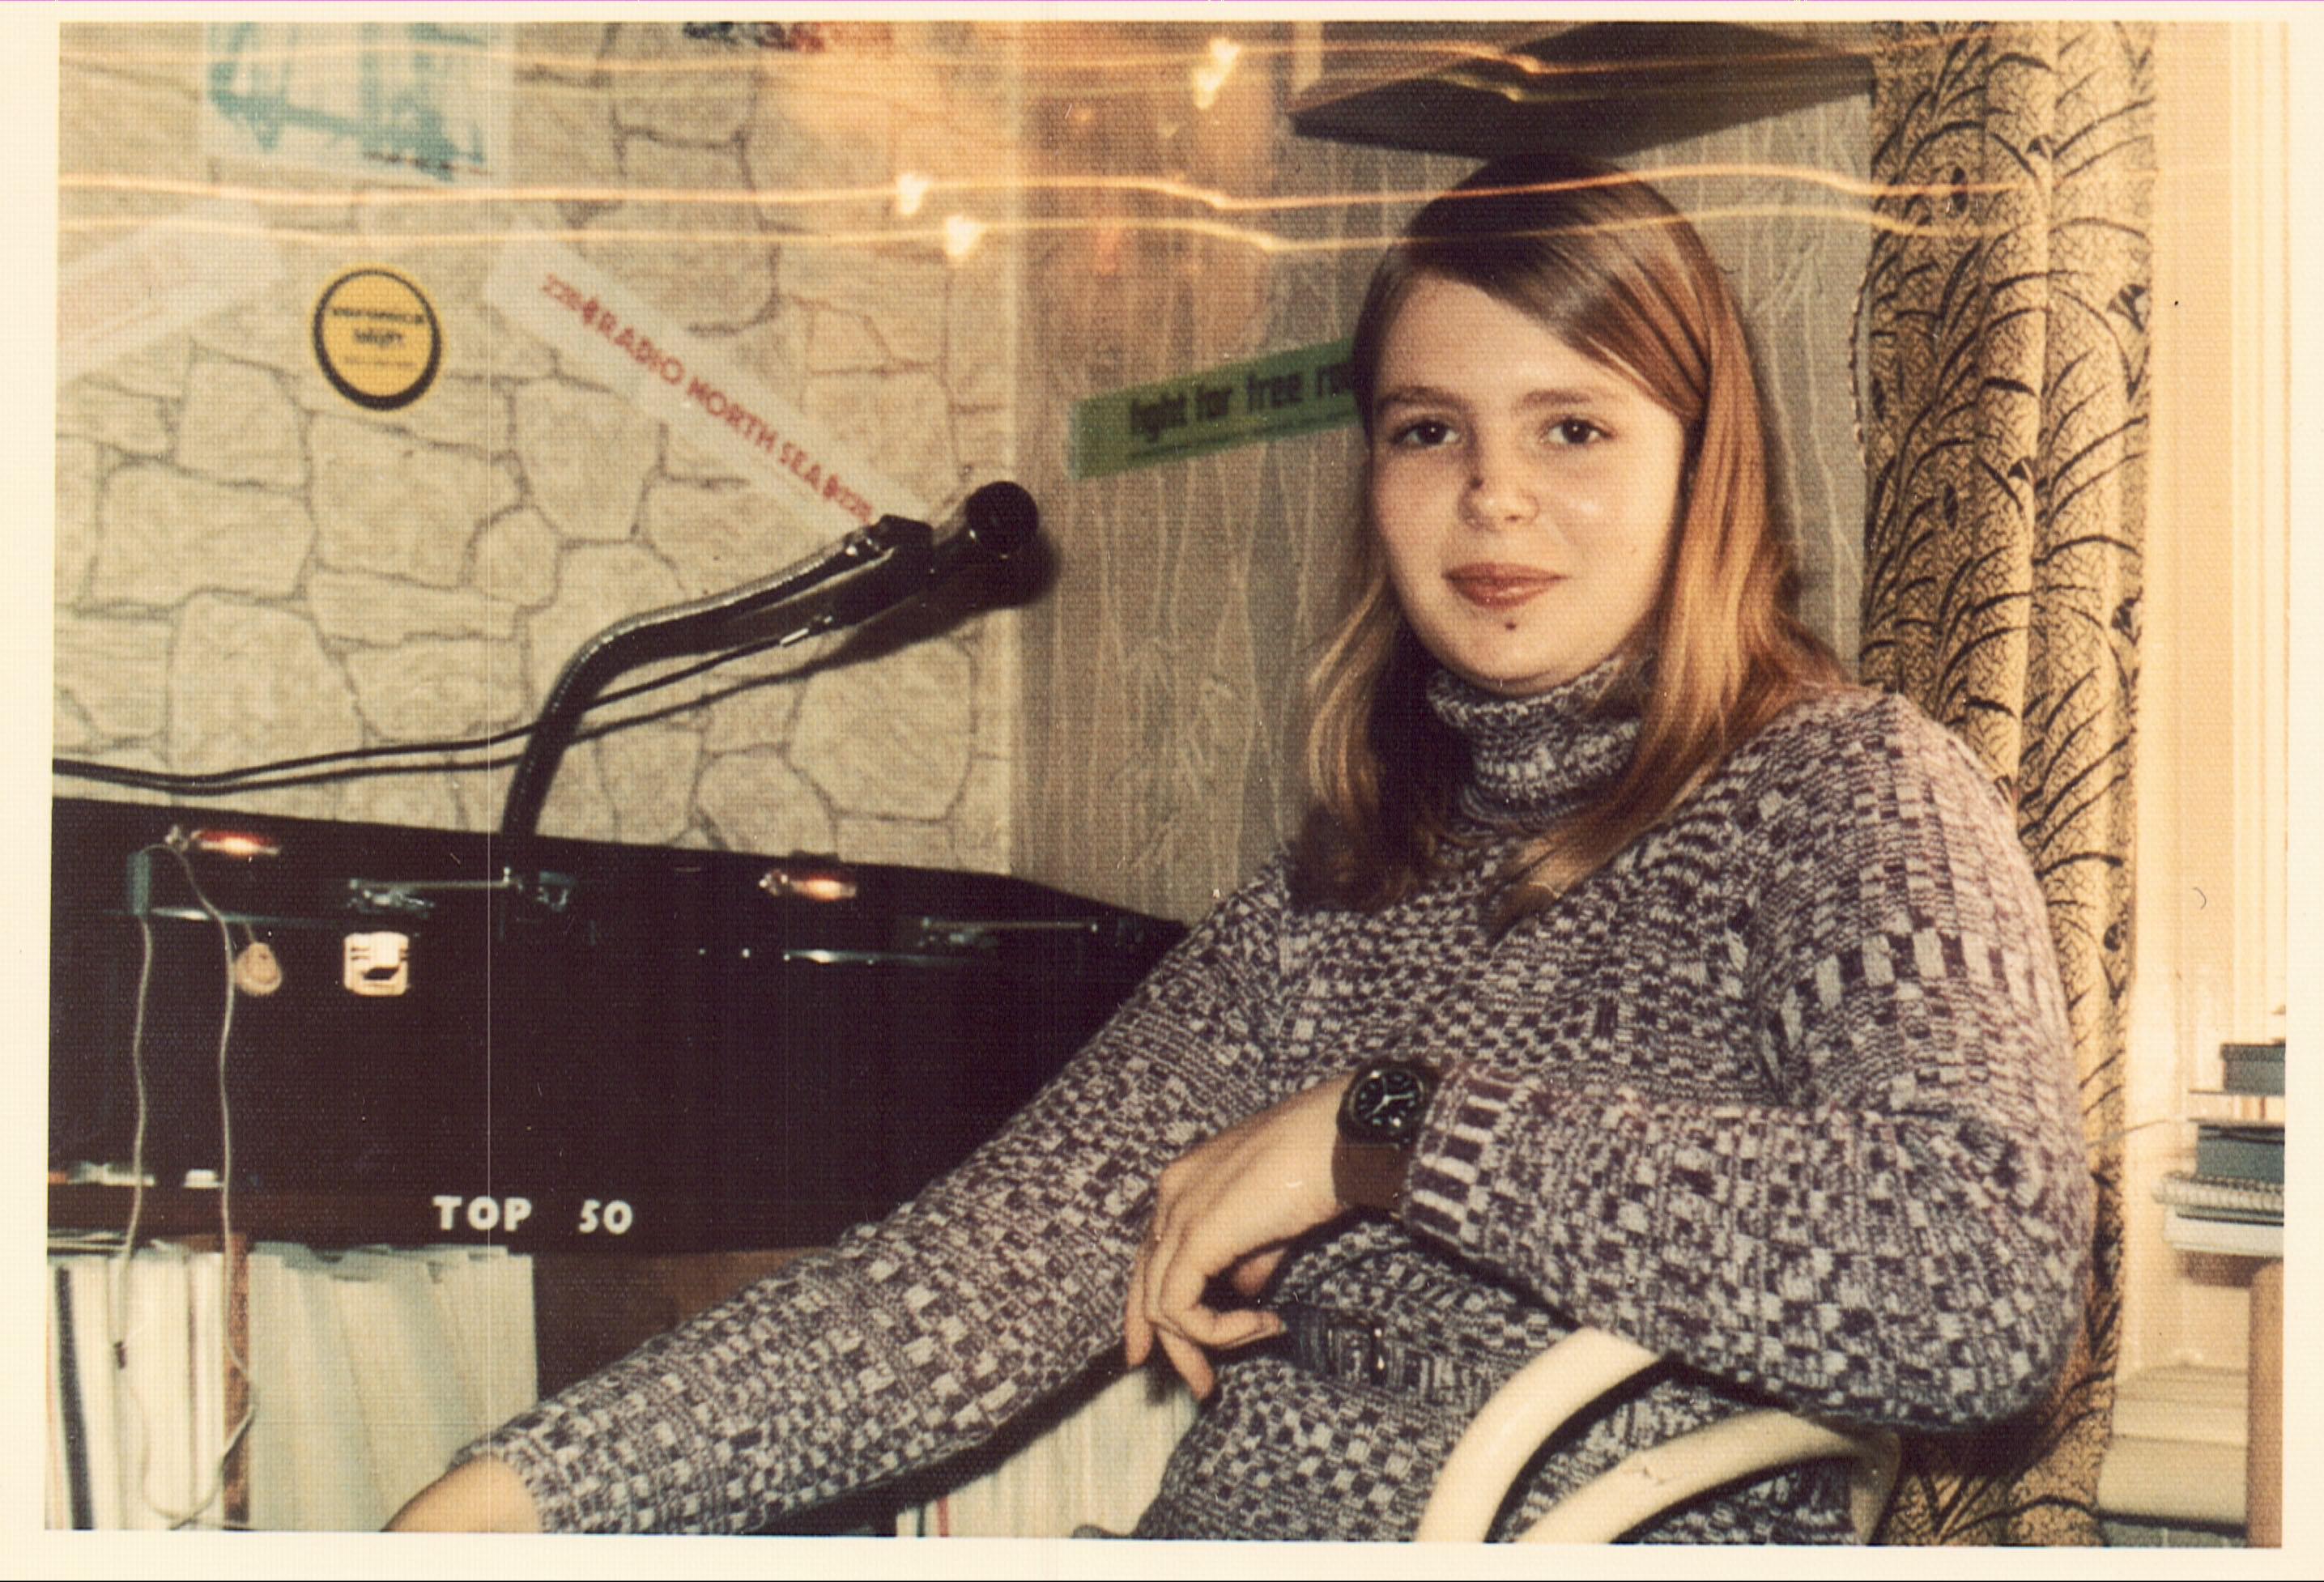 DJ Kathy Jeanette - 1969